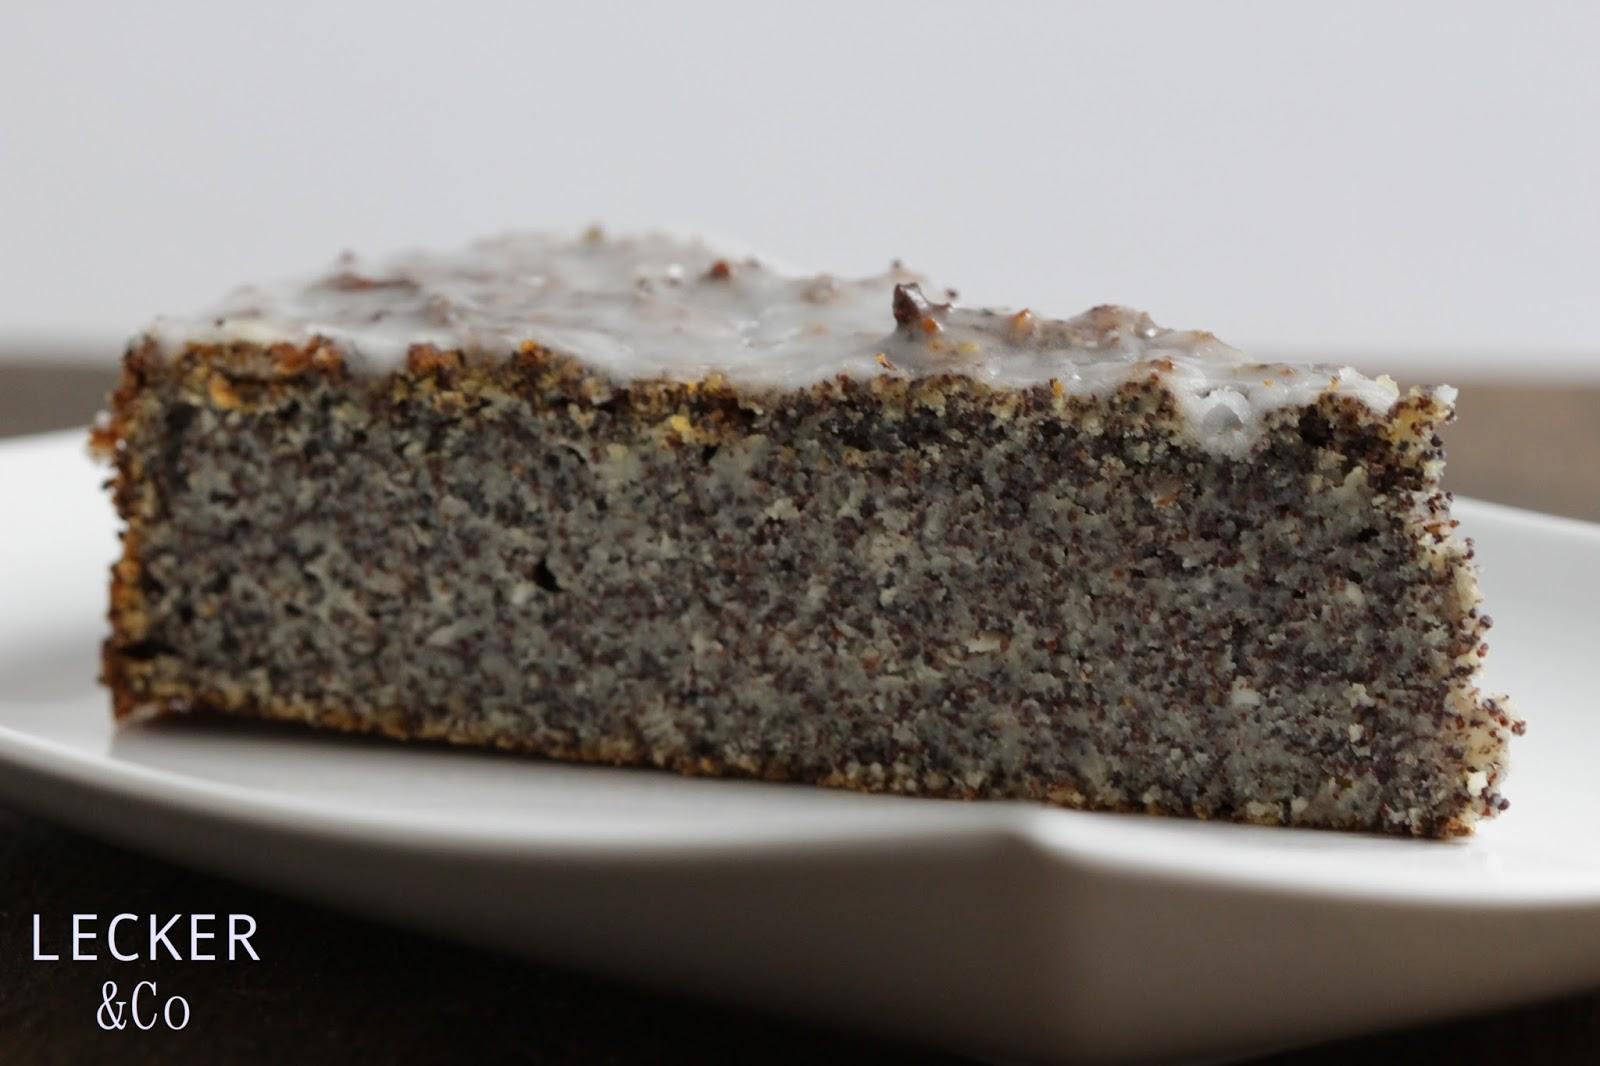 LECKER&Co  Foodblog aus Nürnberg Mohnkuchen  so saftig